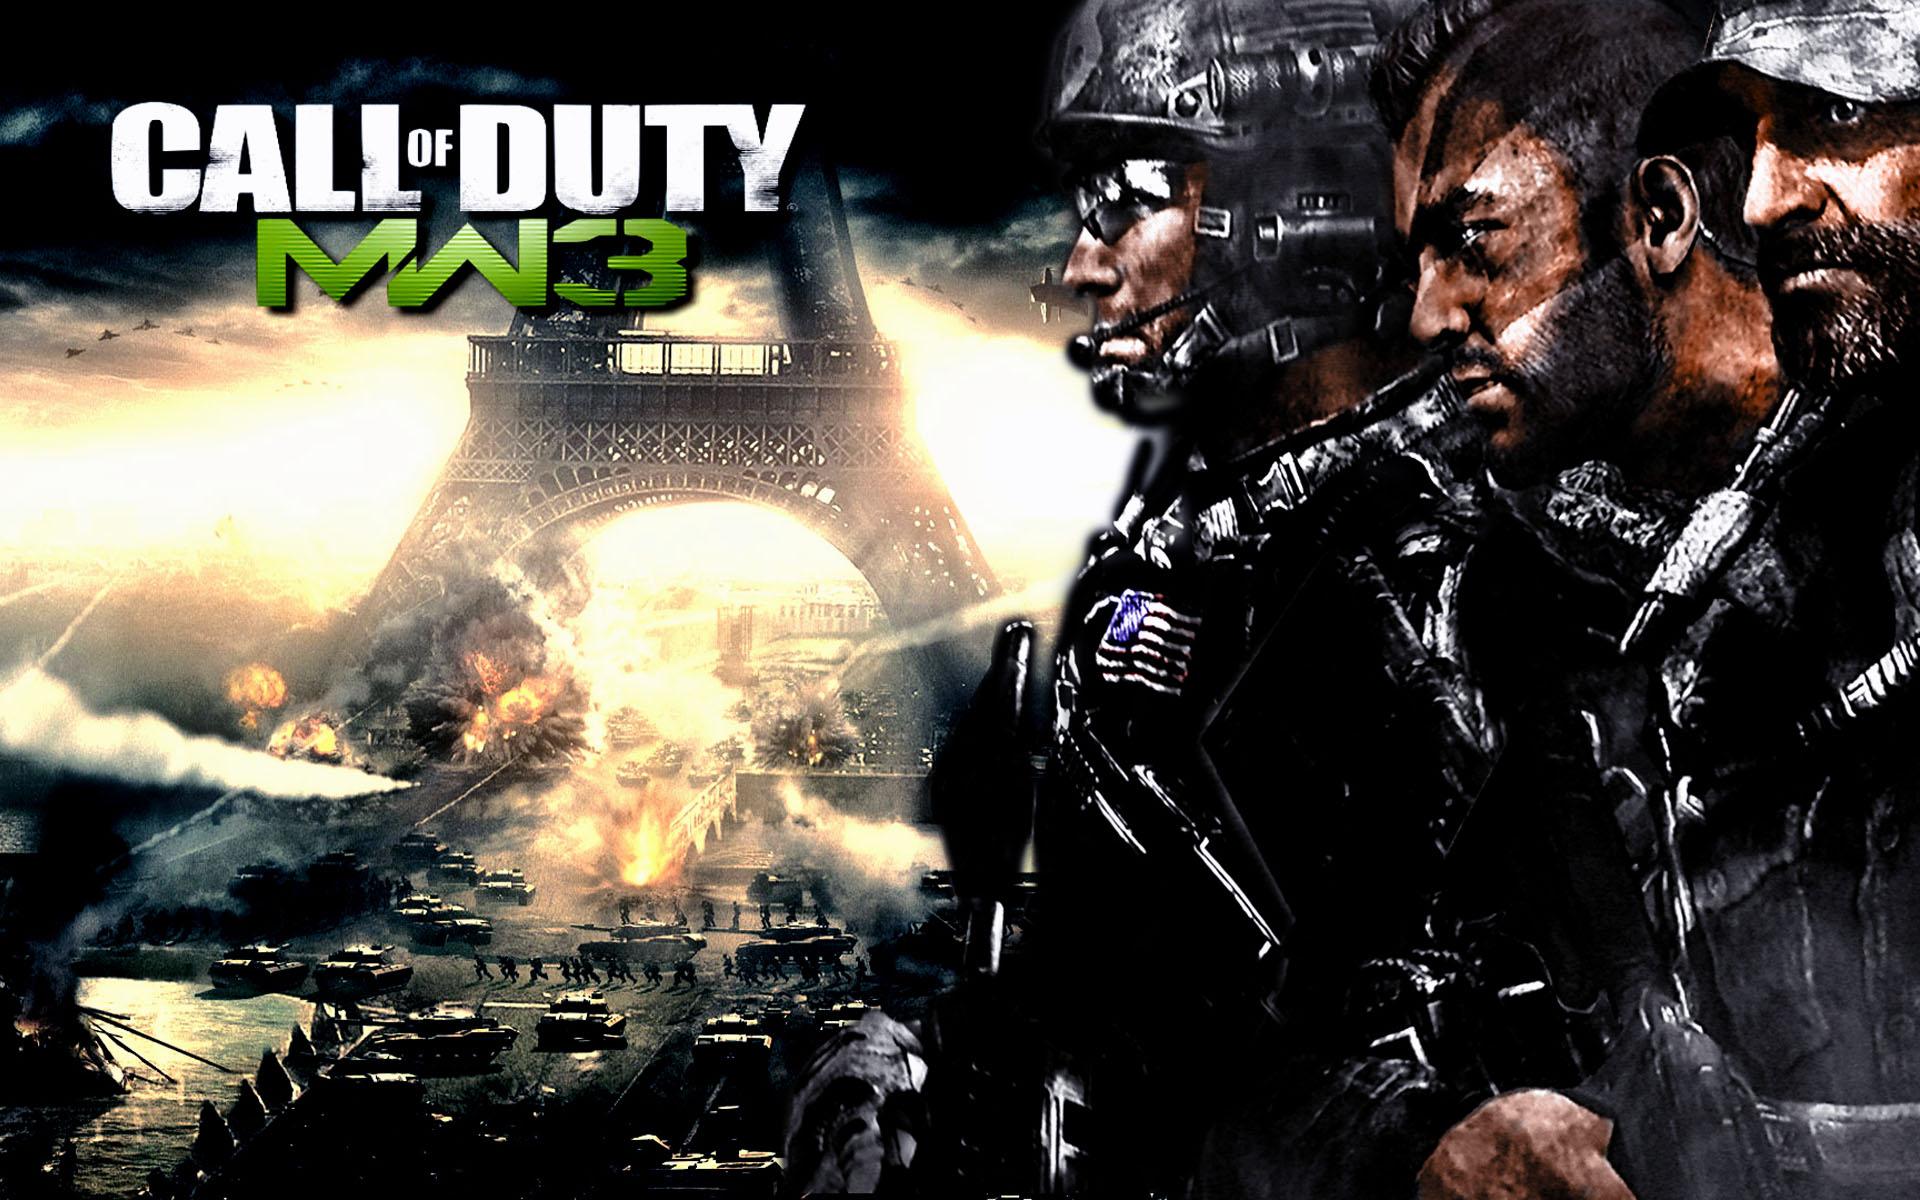 Call of Duty Modern Warfare 4 Wallpaper Call of Duty Modern Warfare 3